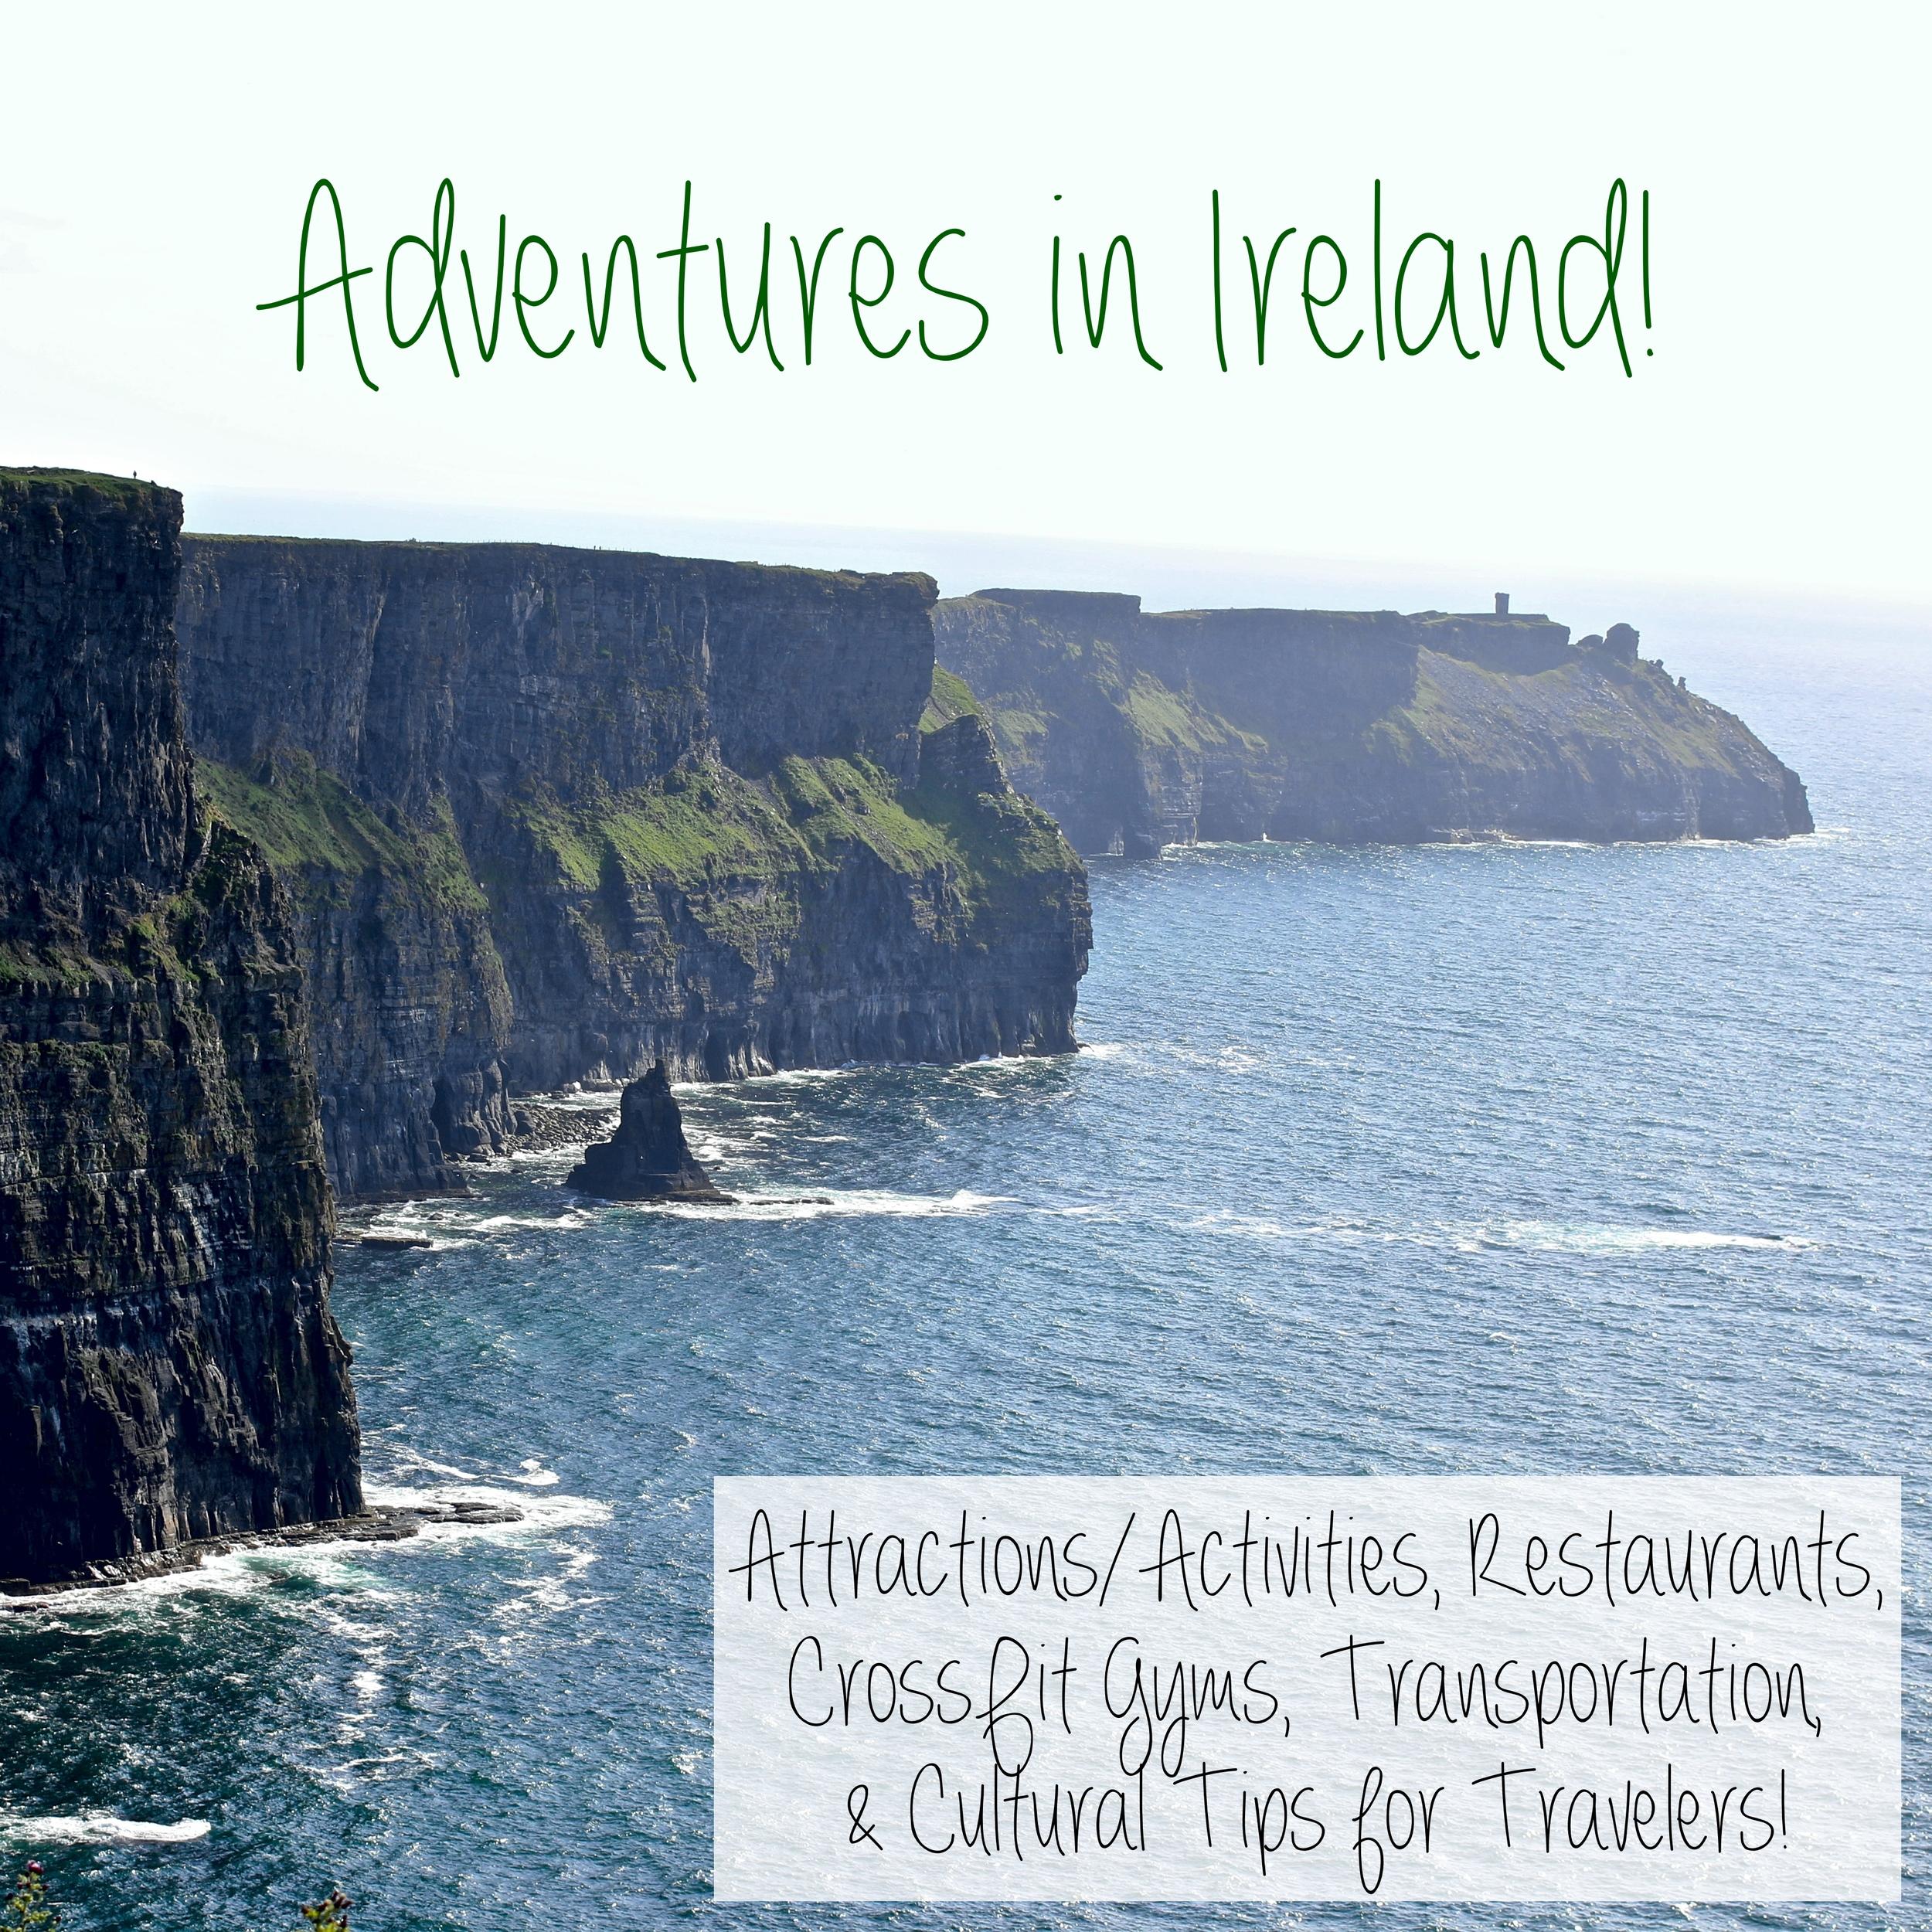 Ireland - Attractions, Activities, Restaurants, CrossFit Gyms, Transportation, and Cultural Tips - www.barbellsandbaking.com